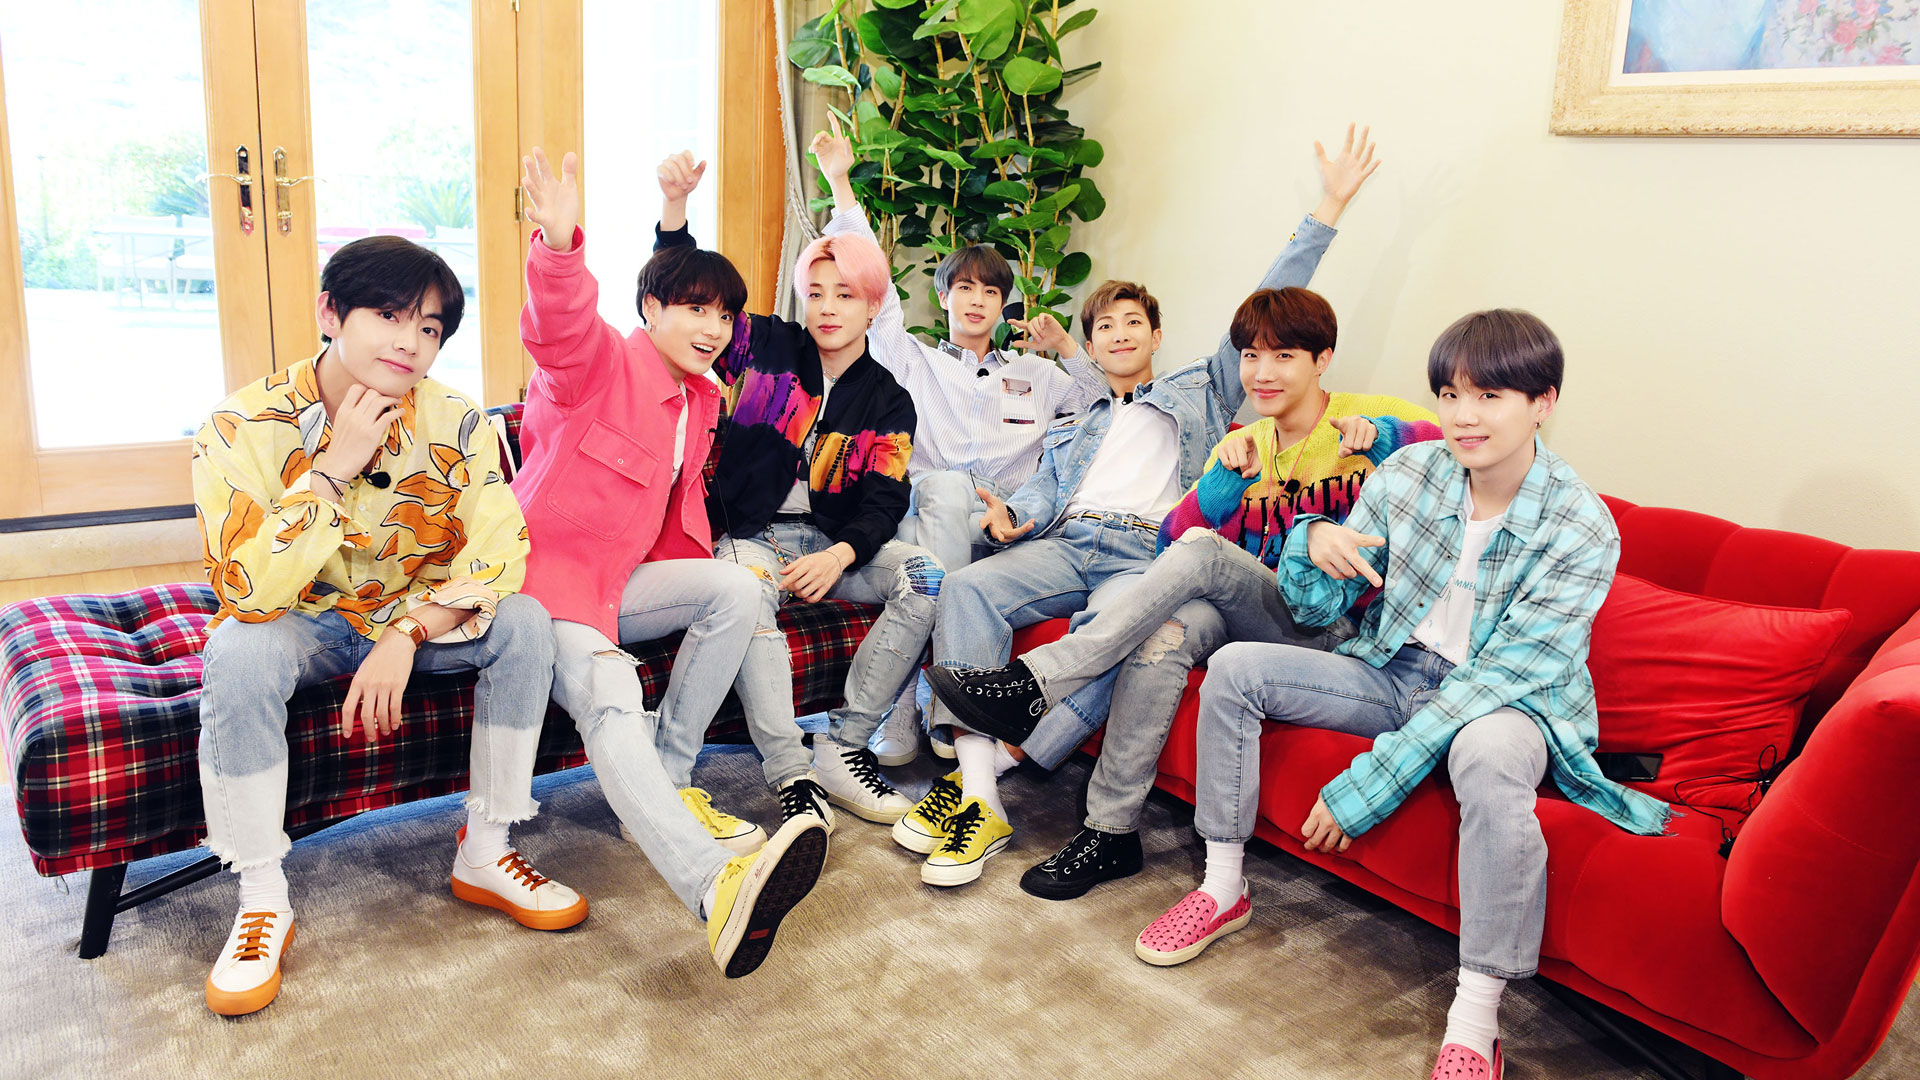 【BTS オリジナル特番&BMA 7月に一挙放送 決定】他、新着トレンド5月31日